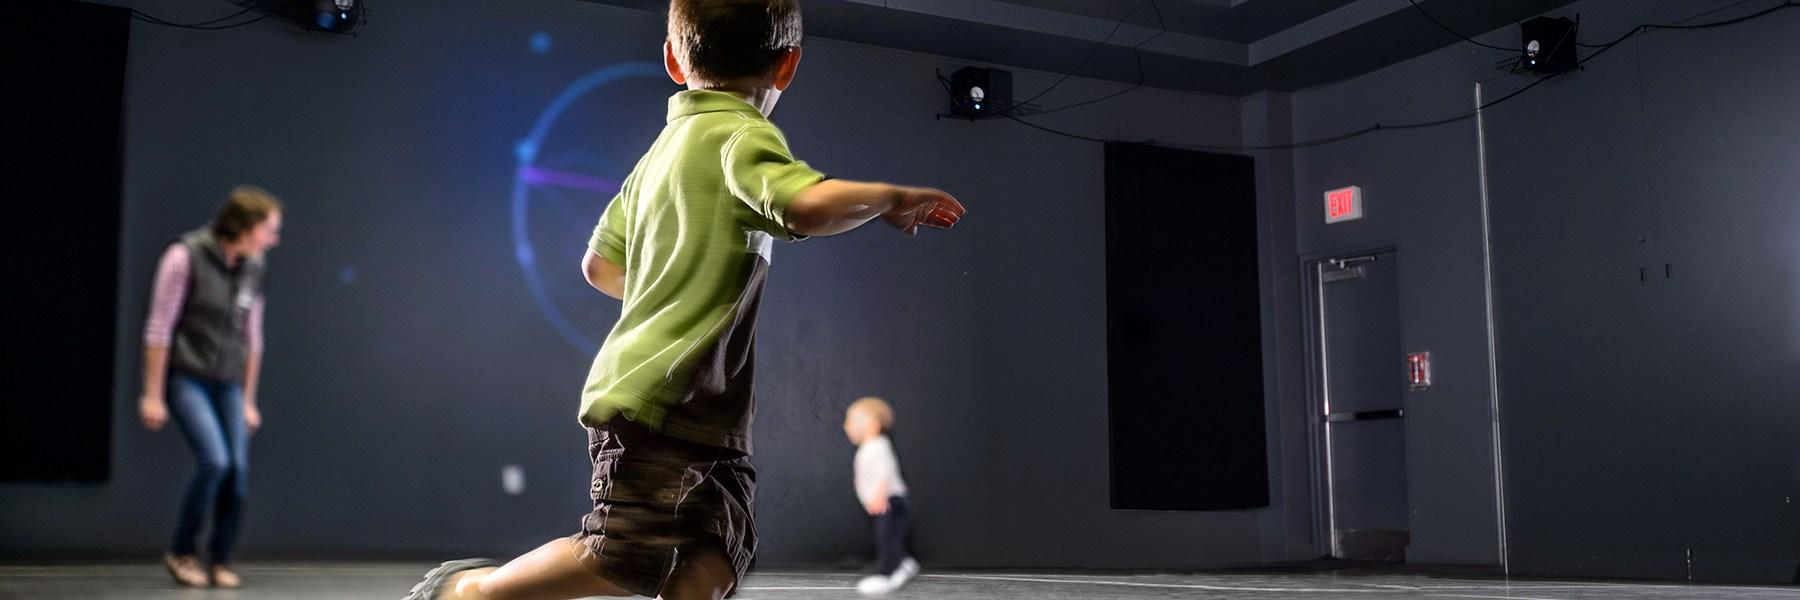 A boy runs through a room that plays sounds.